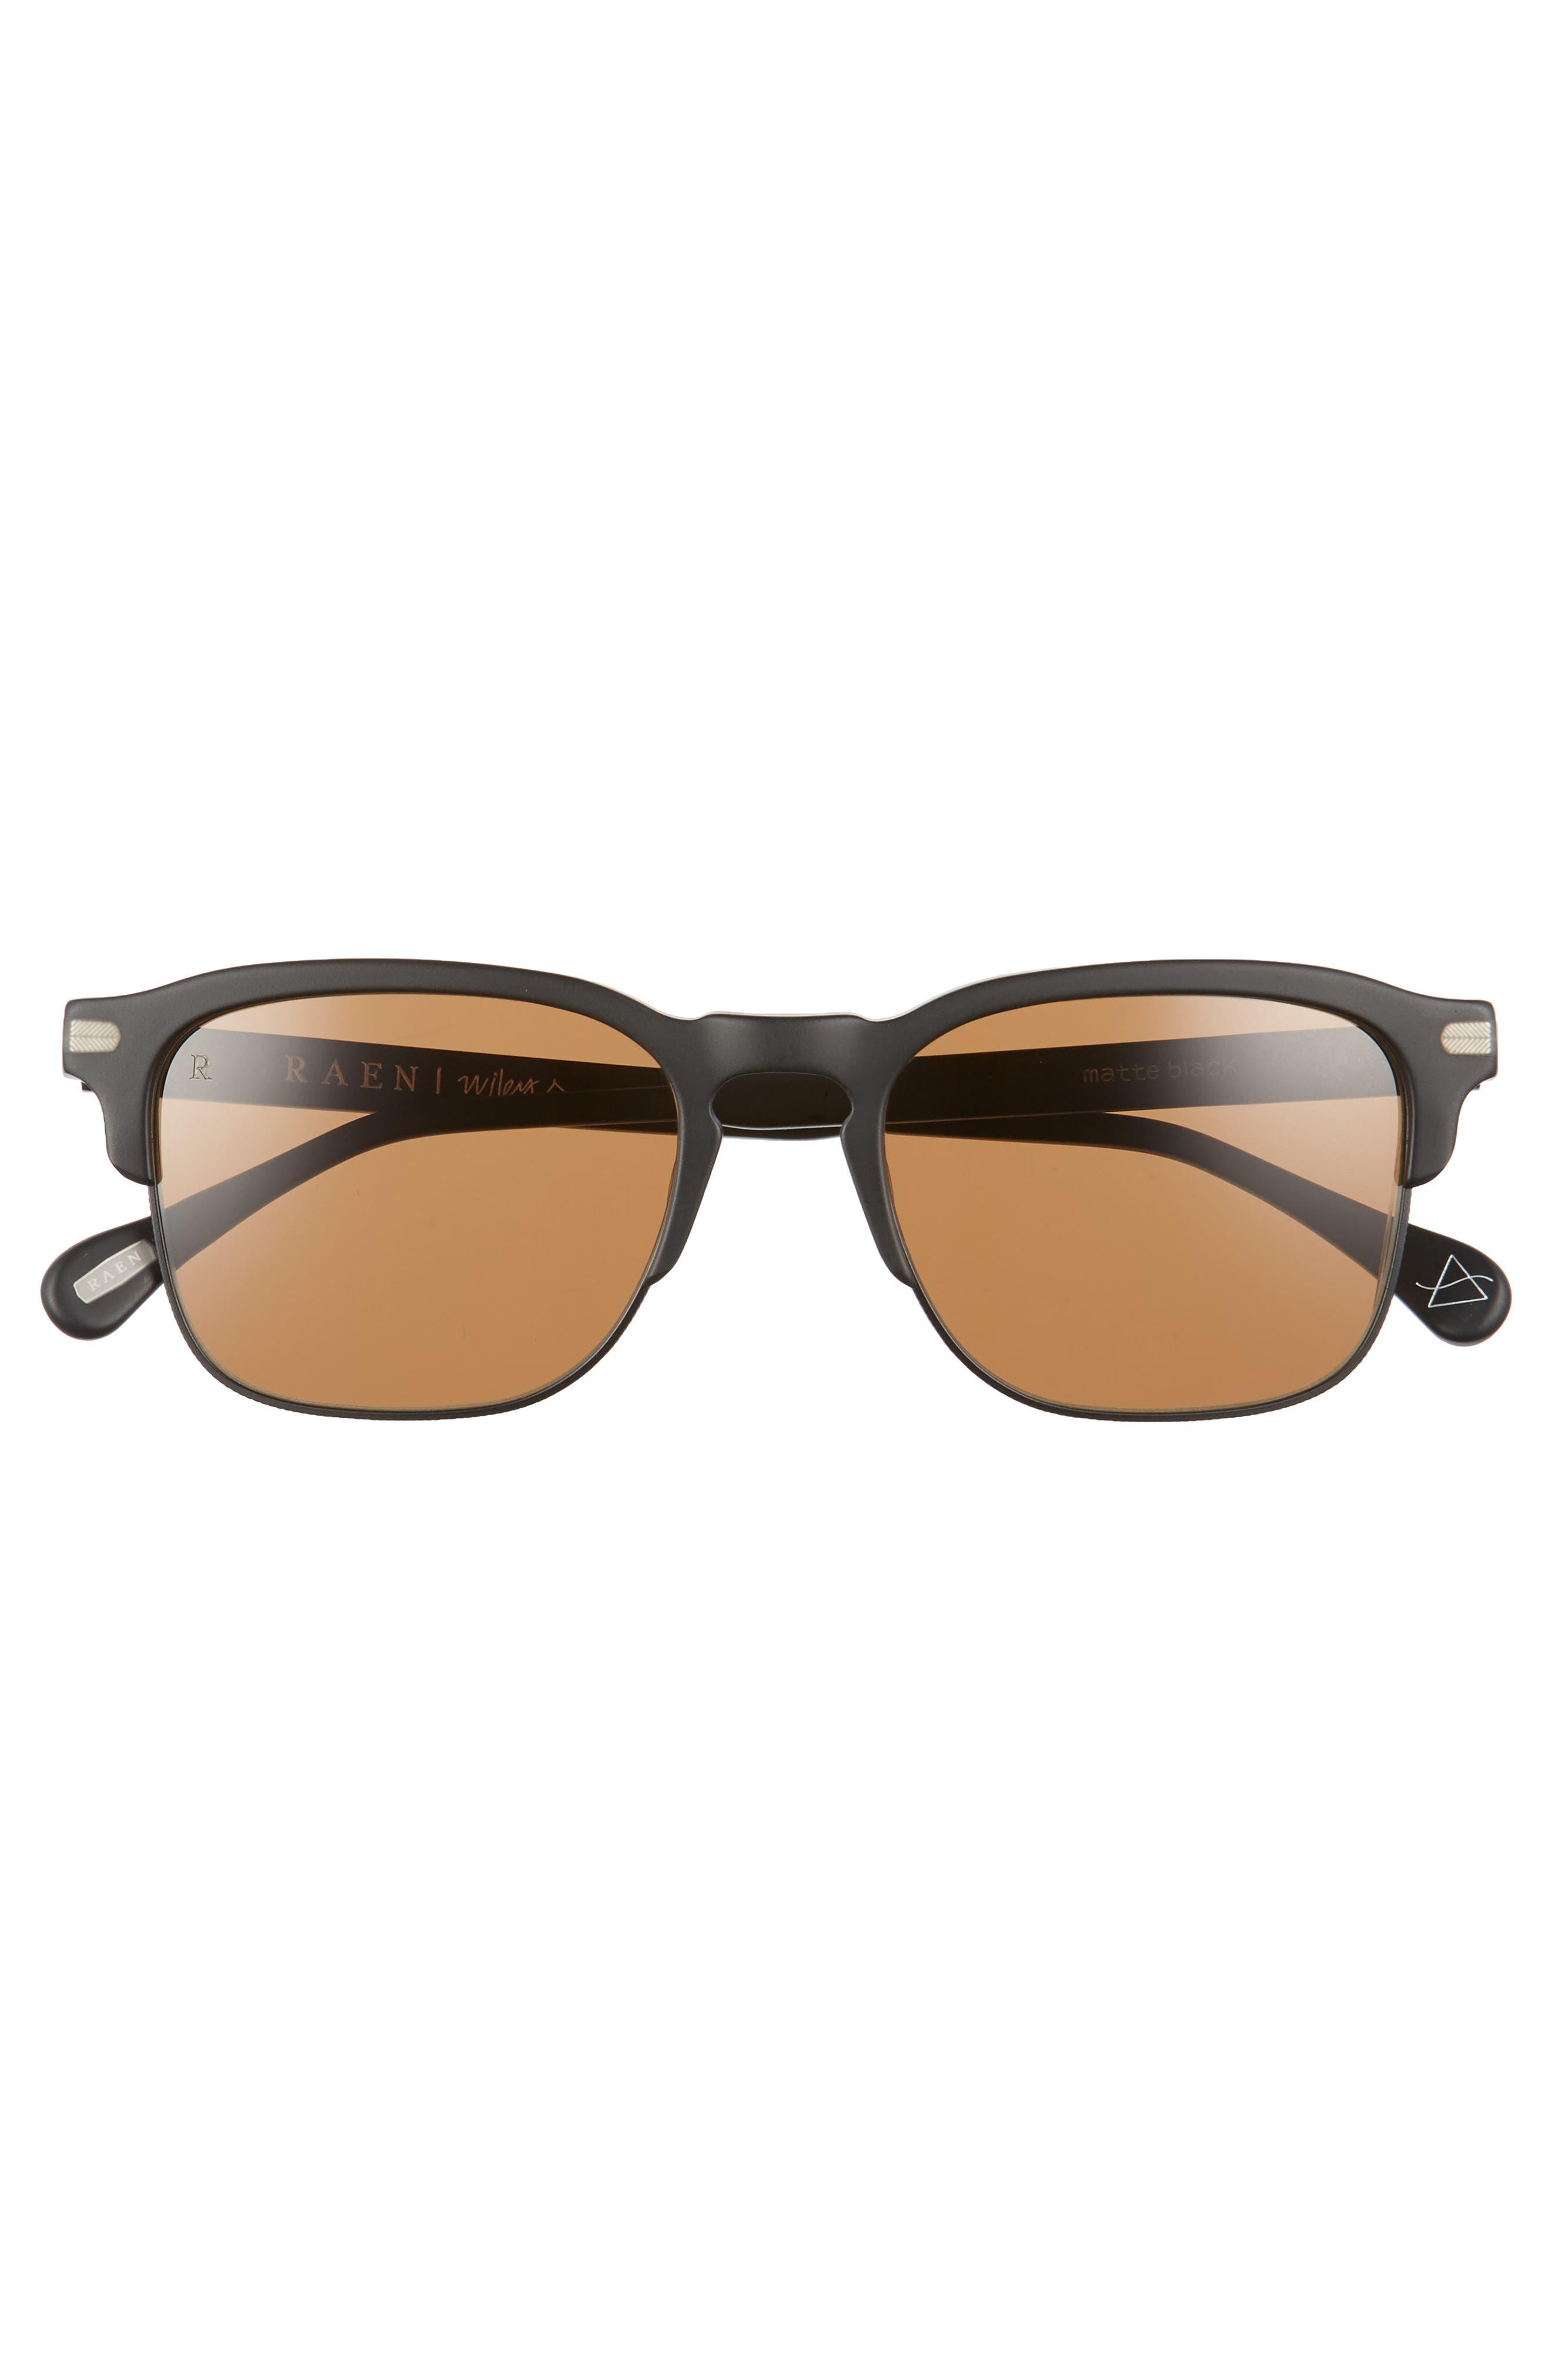 Wiley A 53mm Sunglasses,                             Alternate thumbnail 2, color,                             Matte Black